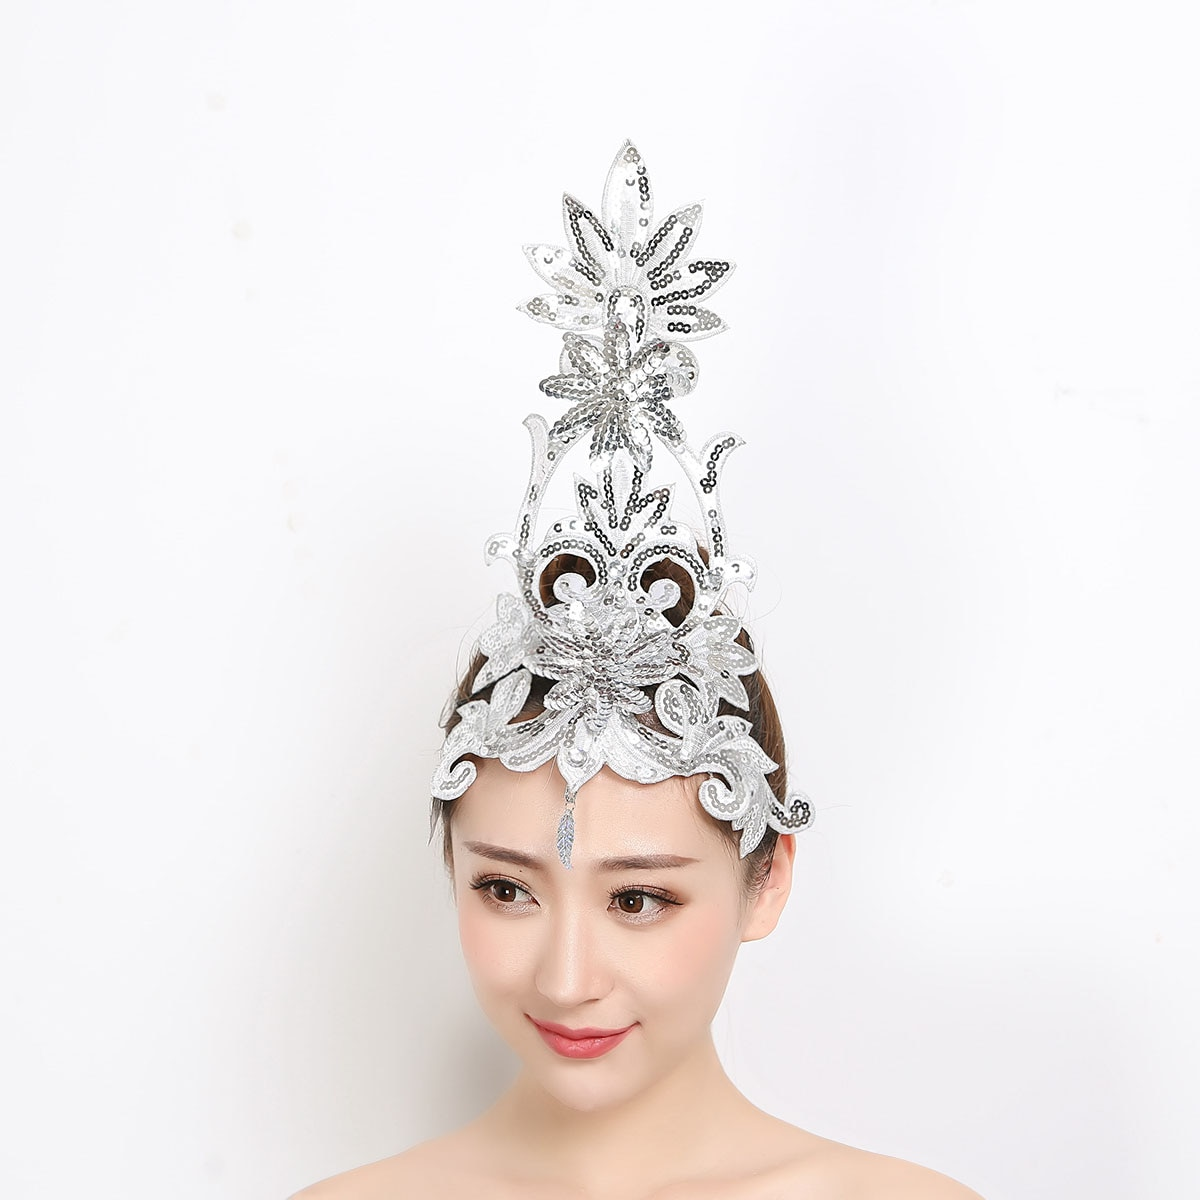 Dance Headdress Performance Kids Hair Accessories Tiara Dance Headdress Multi-color Classical Dance Headdress